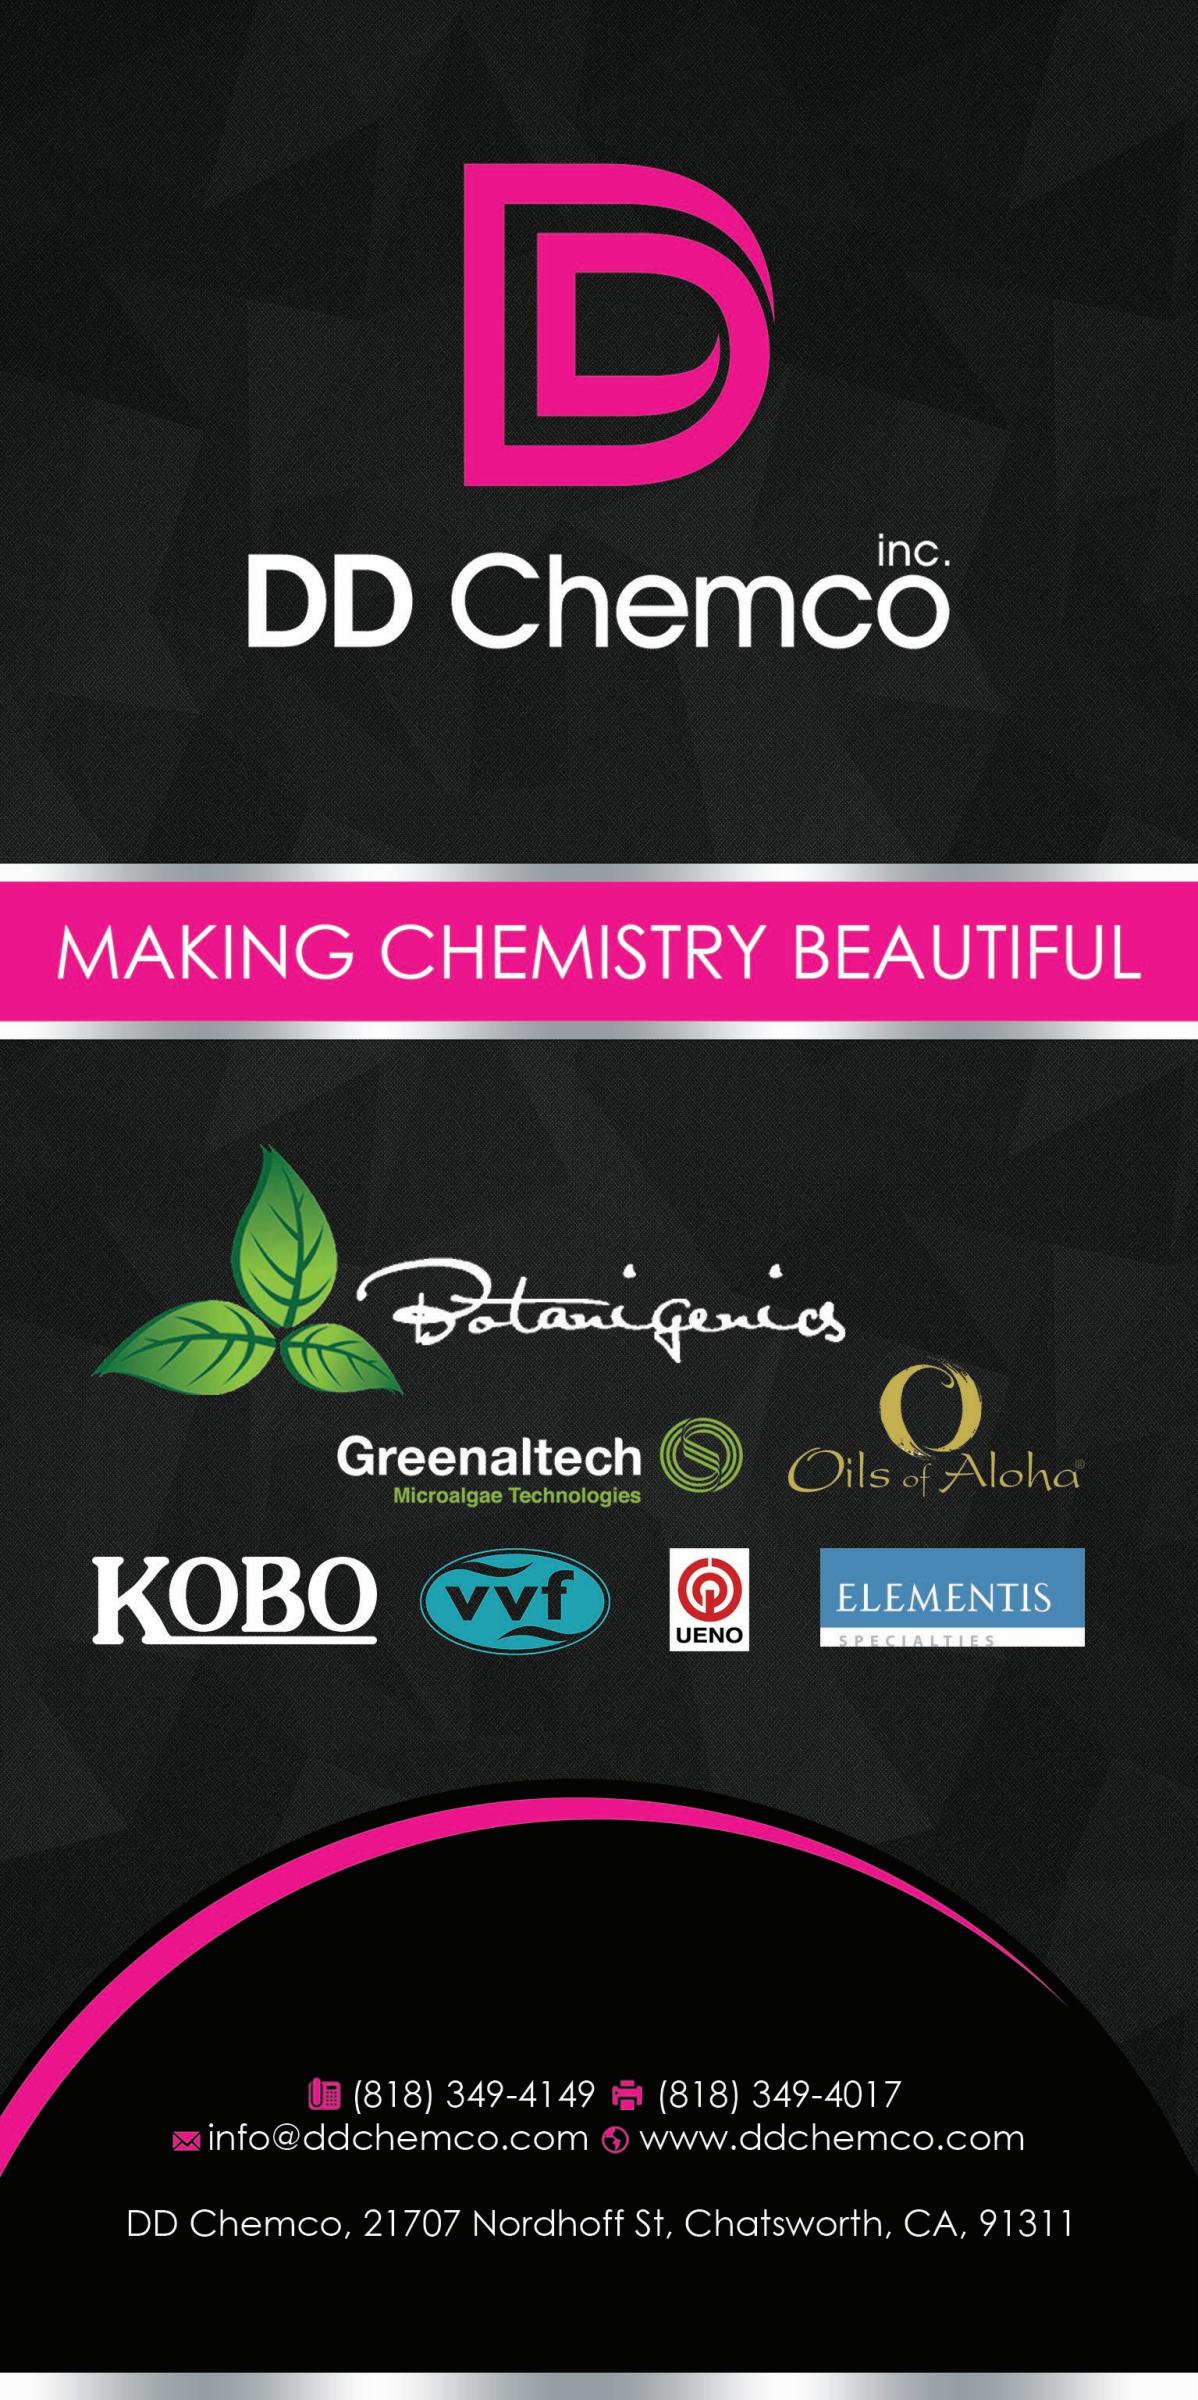 DD Chemco Catalog Advertisement